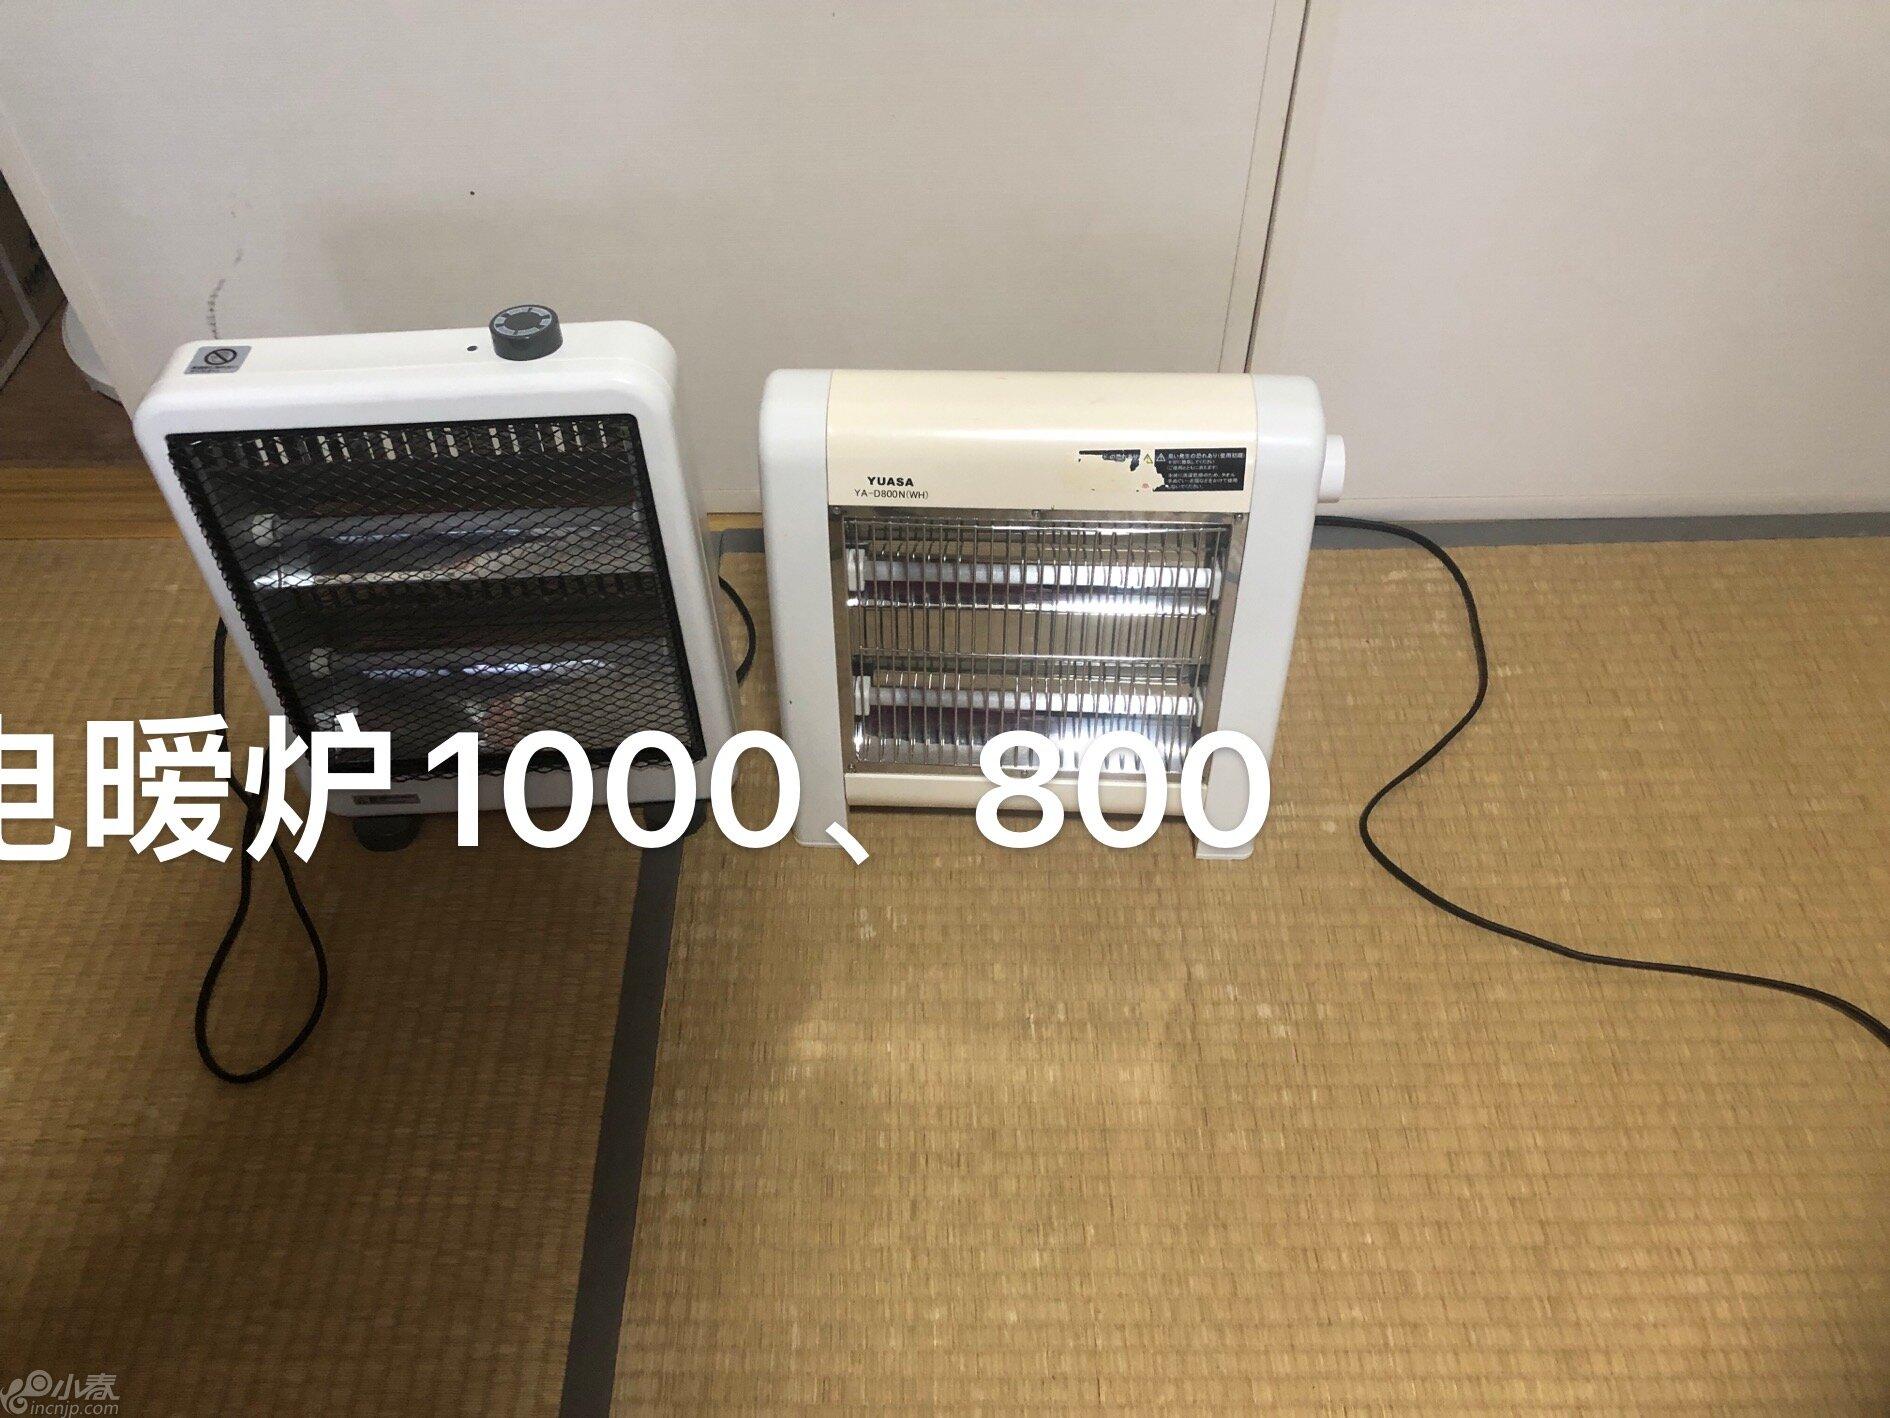 443B57D0-E7D0-4C5F-B232-A21857CFAF51.jpeg